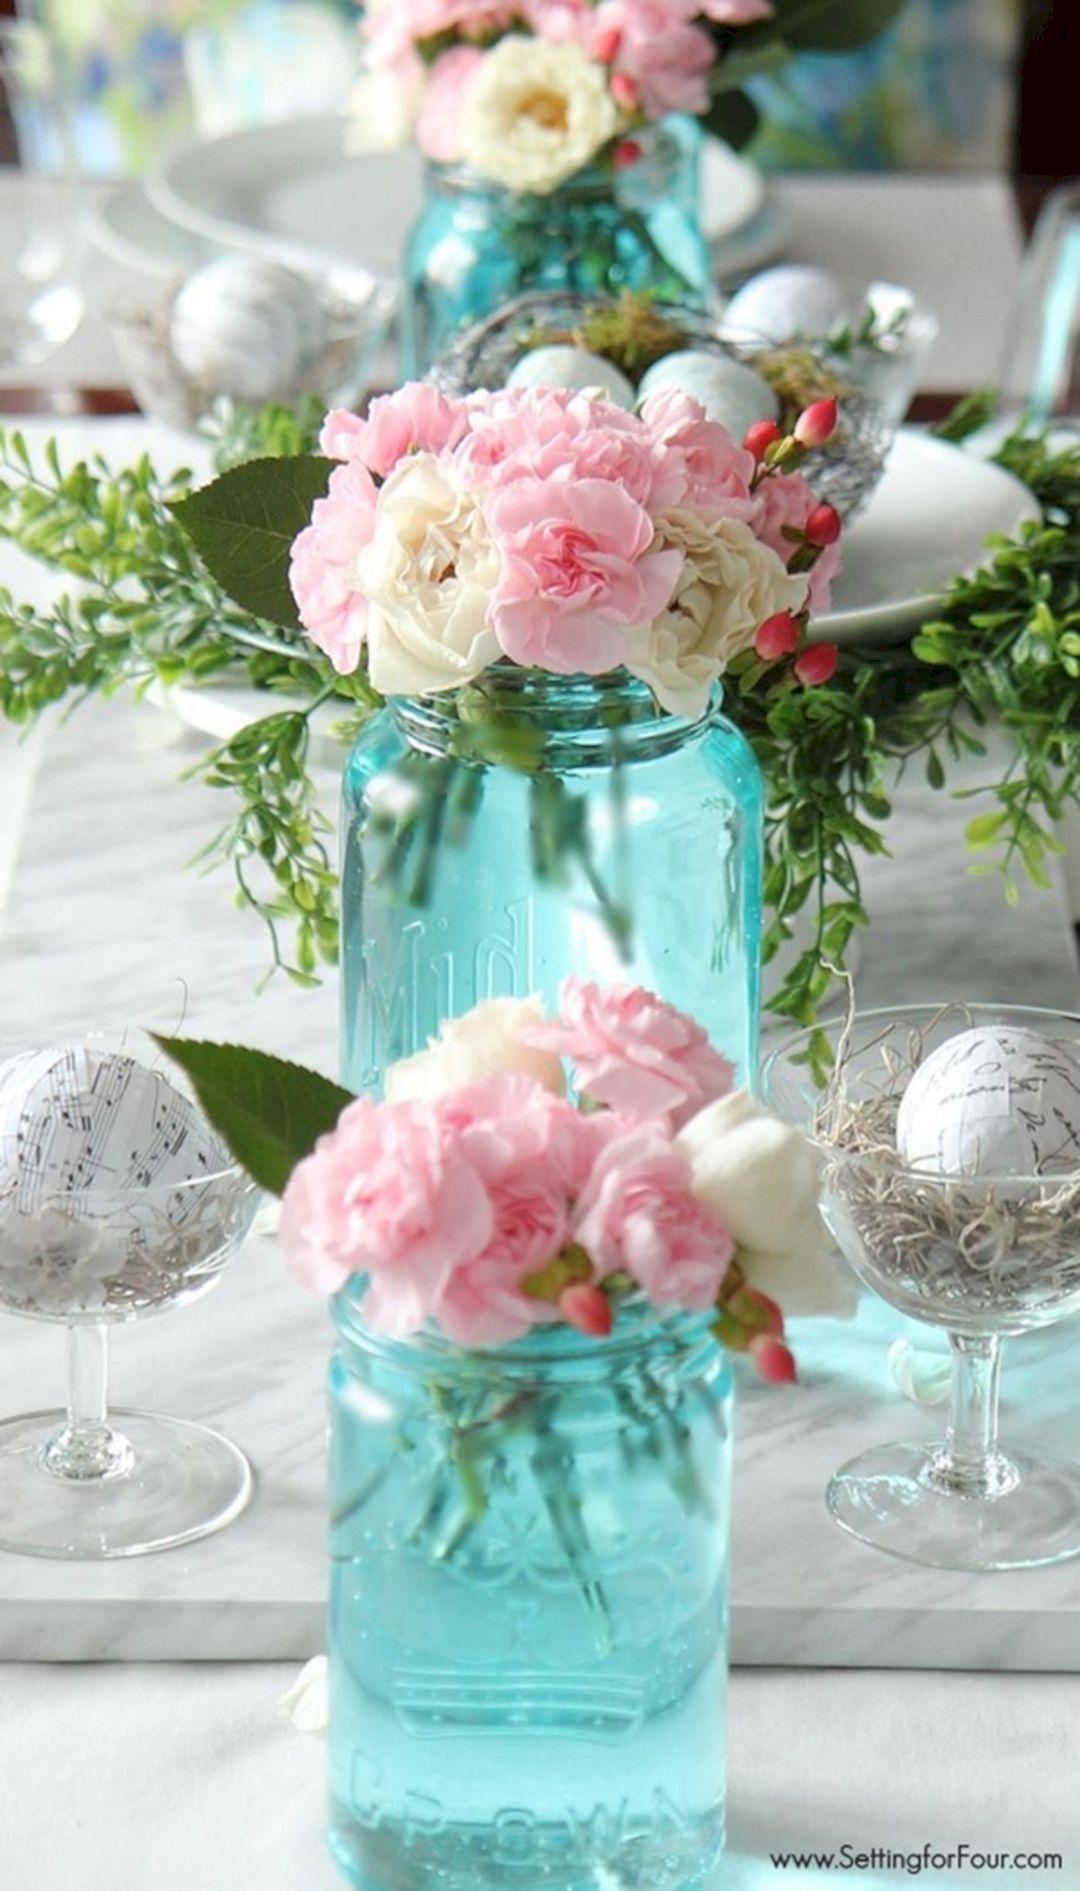 Wedding decor ideas for 2018